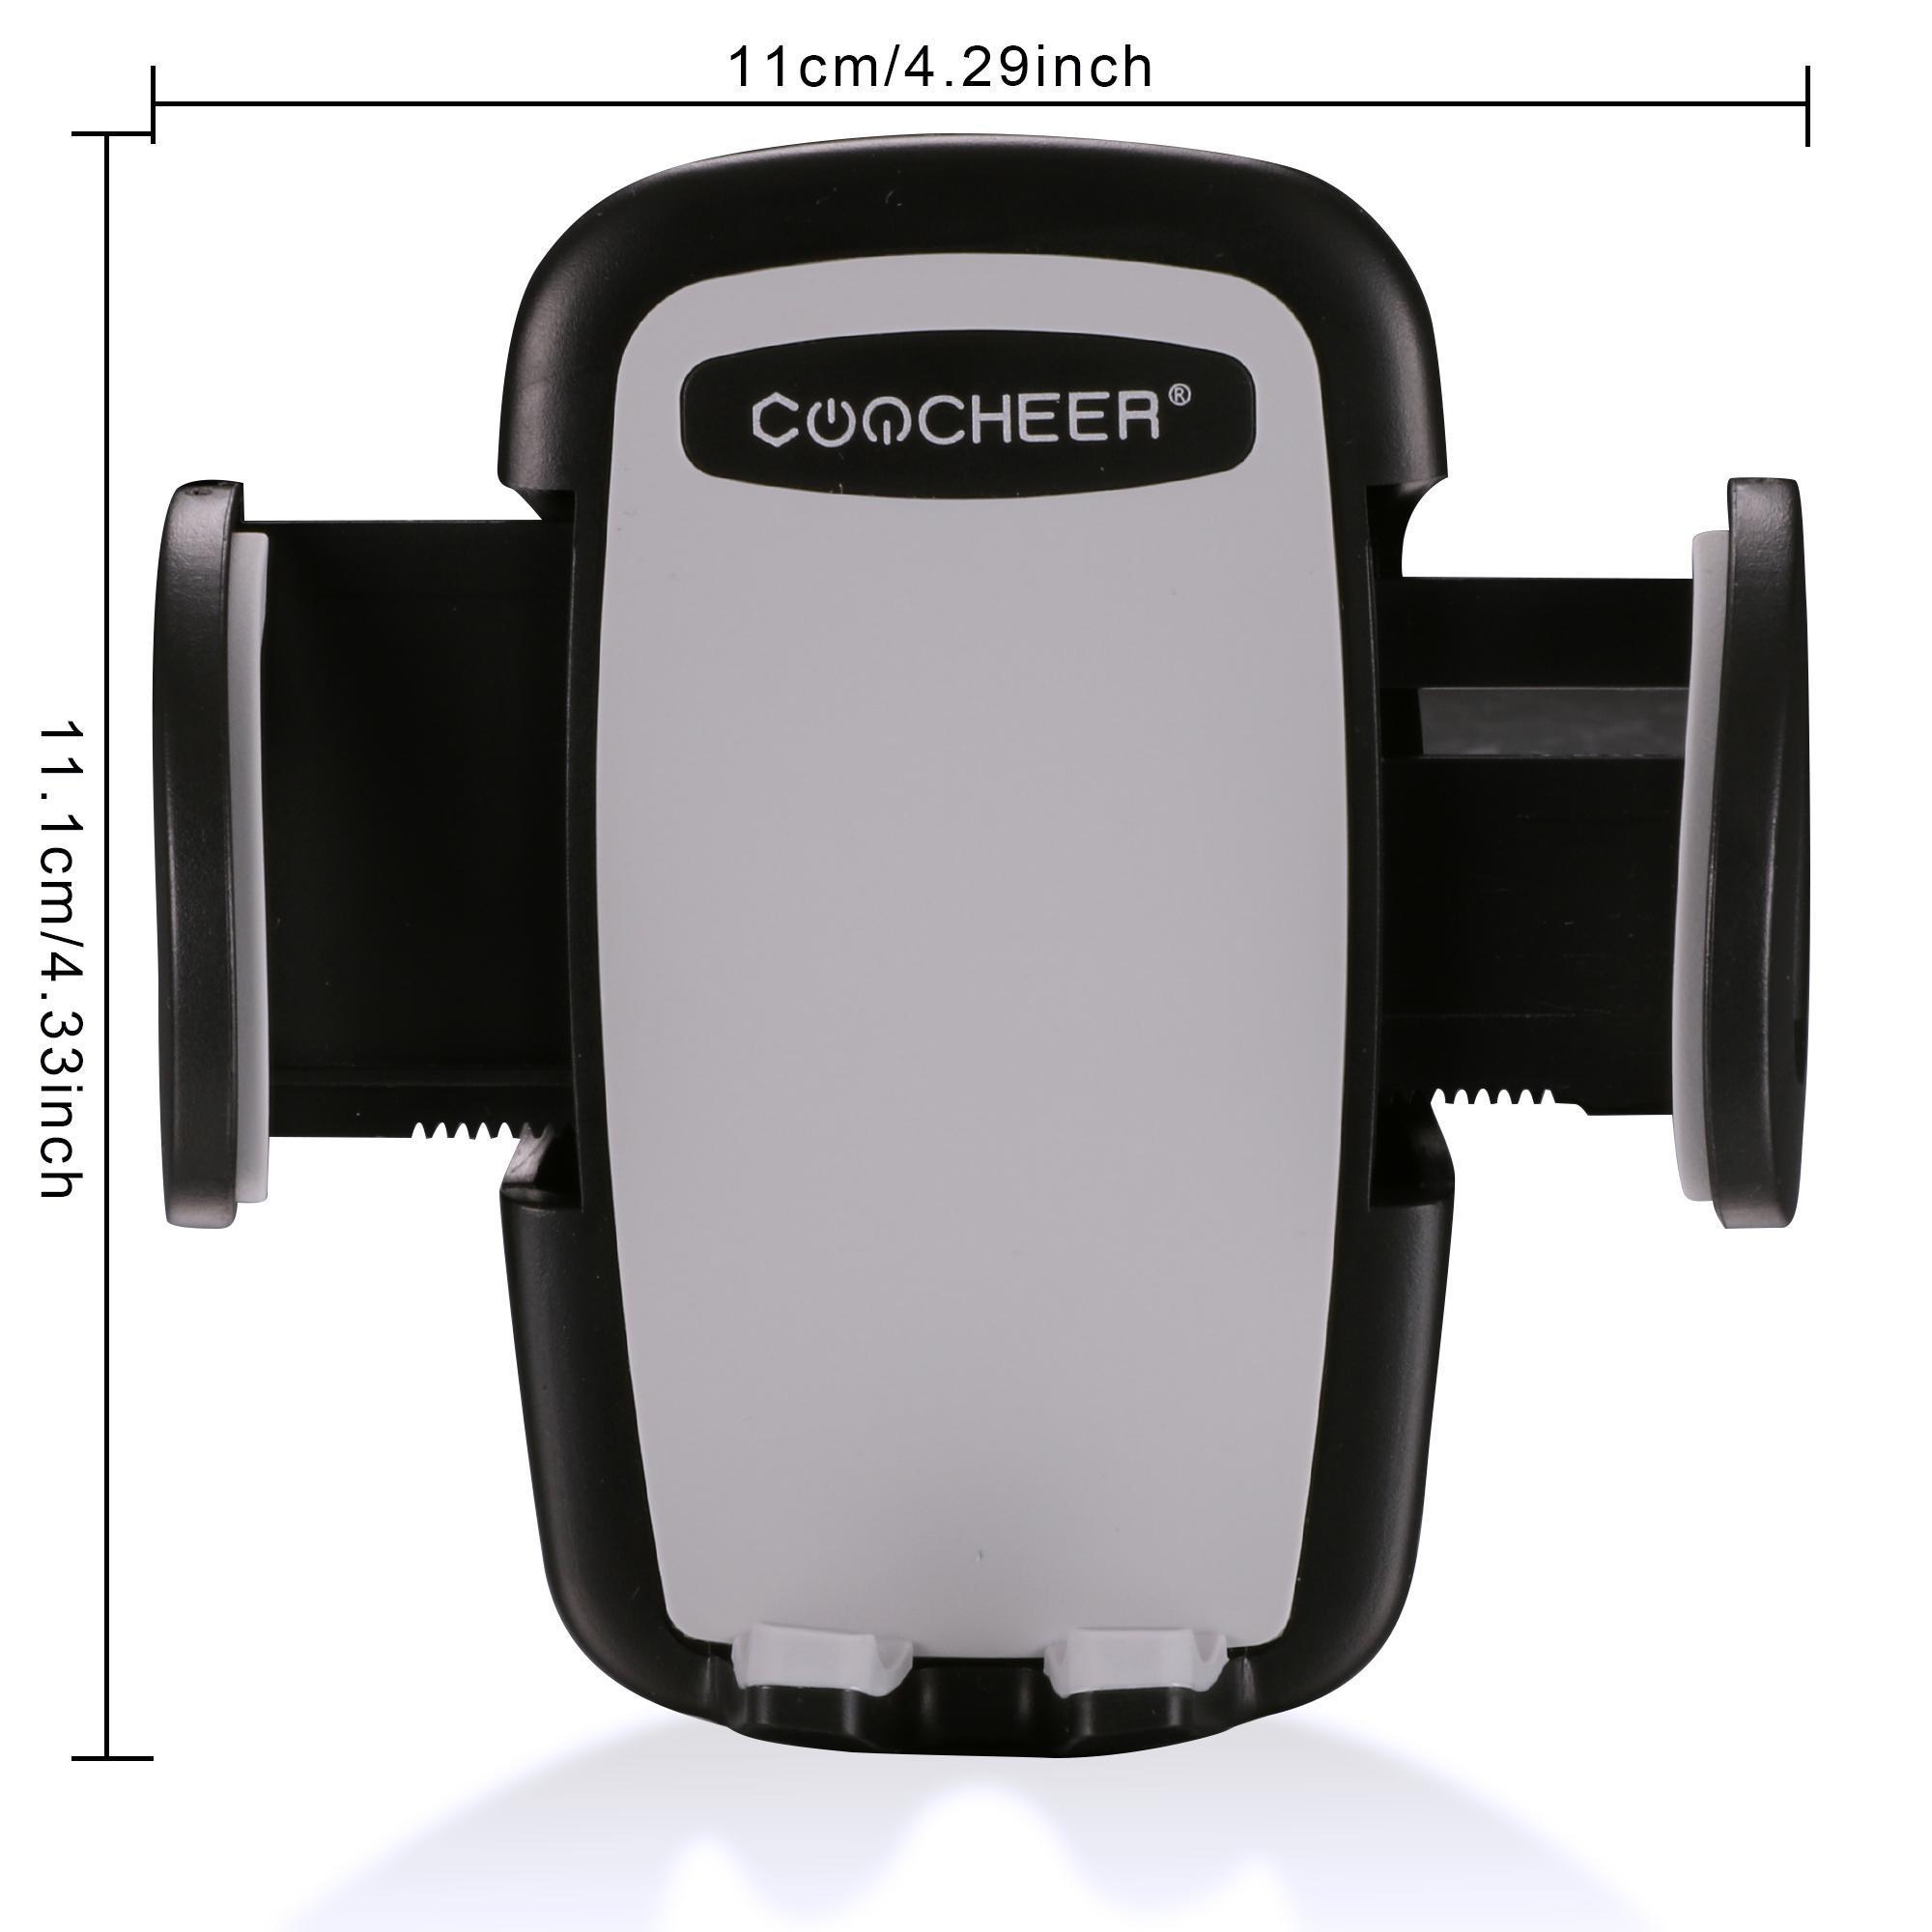 Universal Air Vent Mount Car Smartphone Holder 4